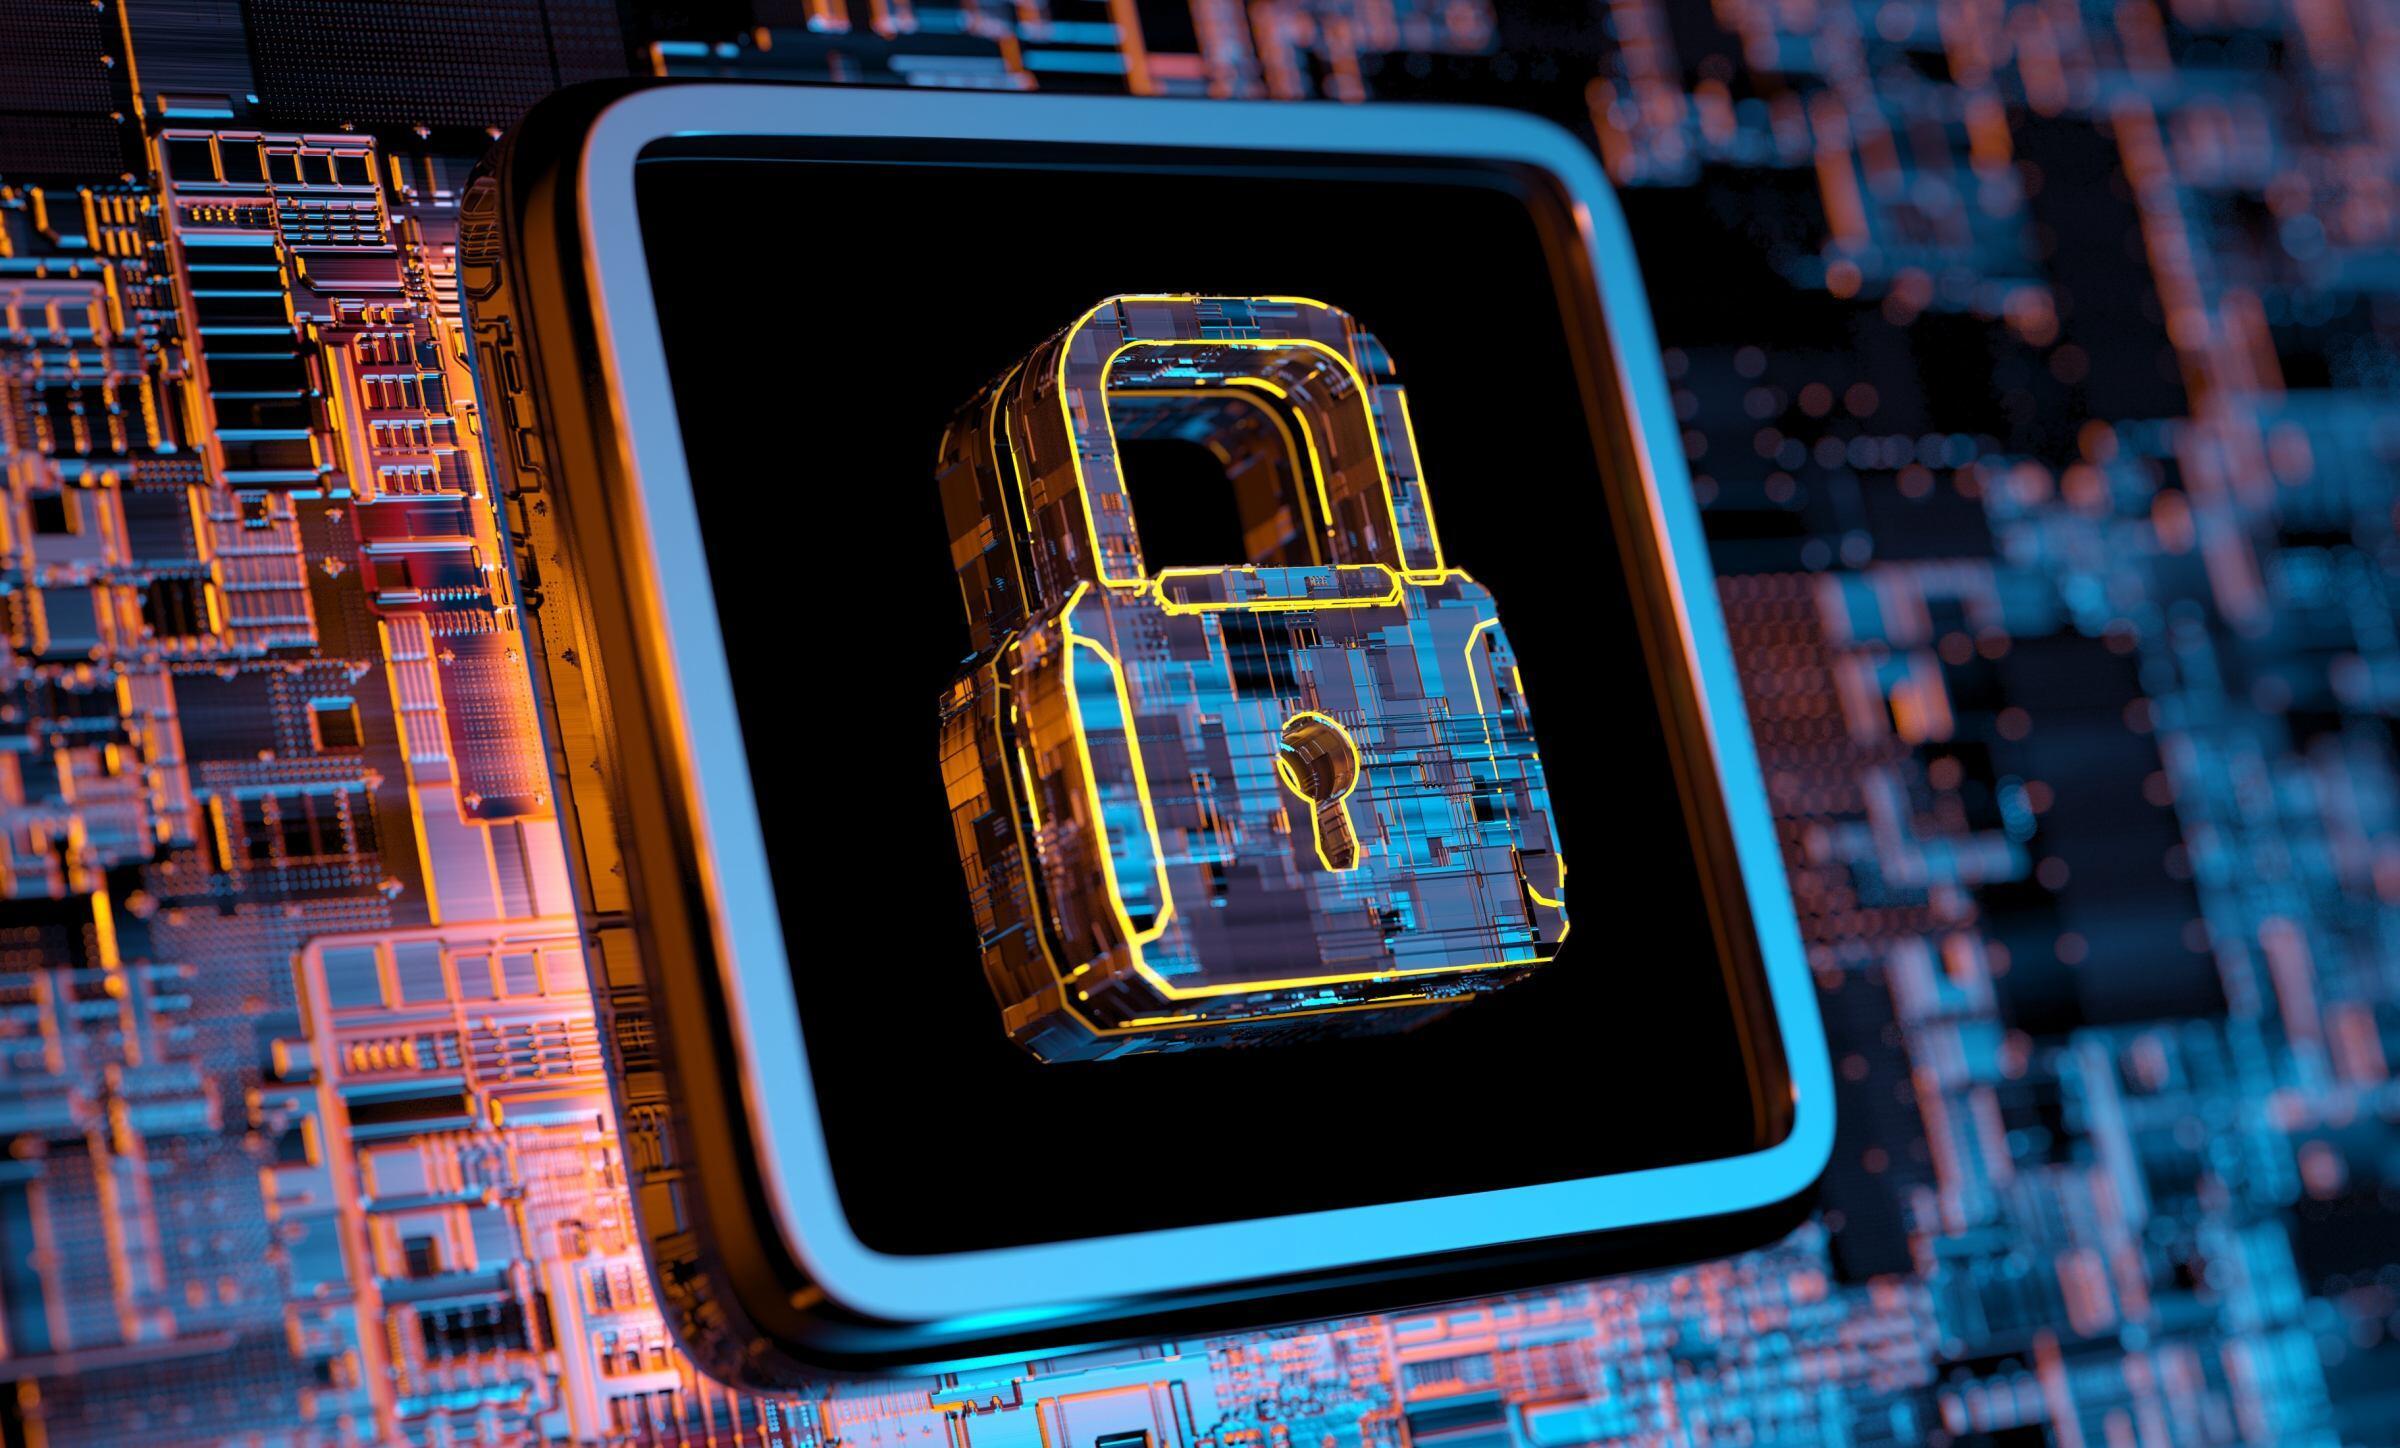 20 0112 St Cybersecurity1 - RGM Tecnologia da Informação